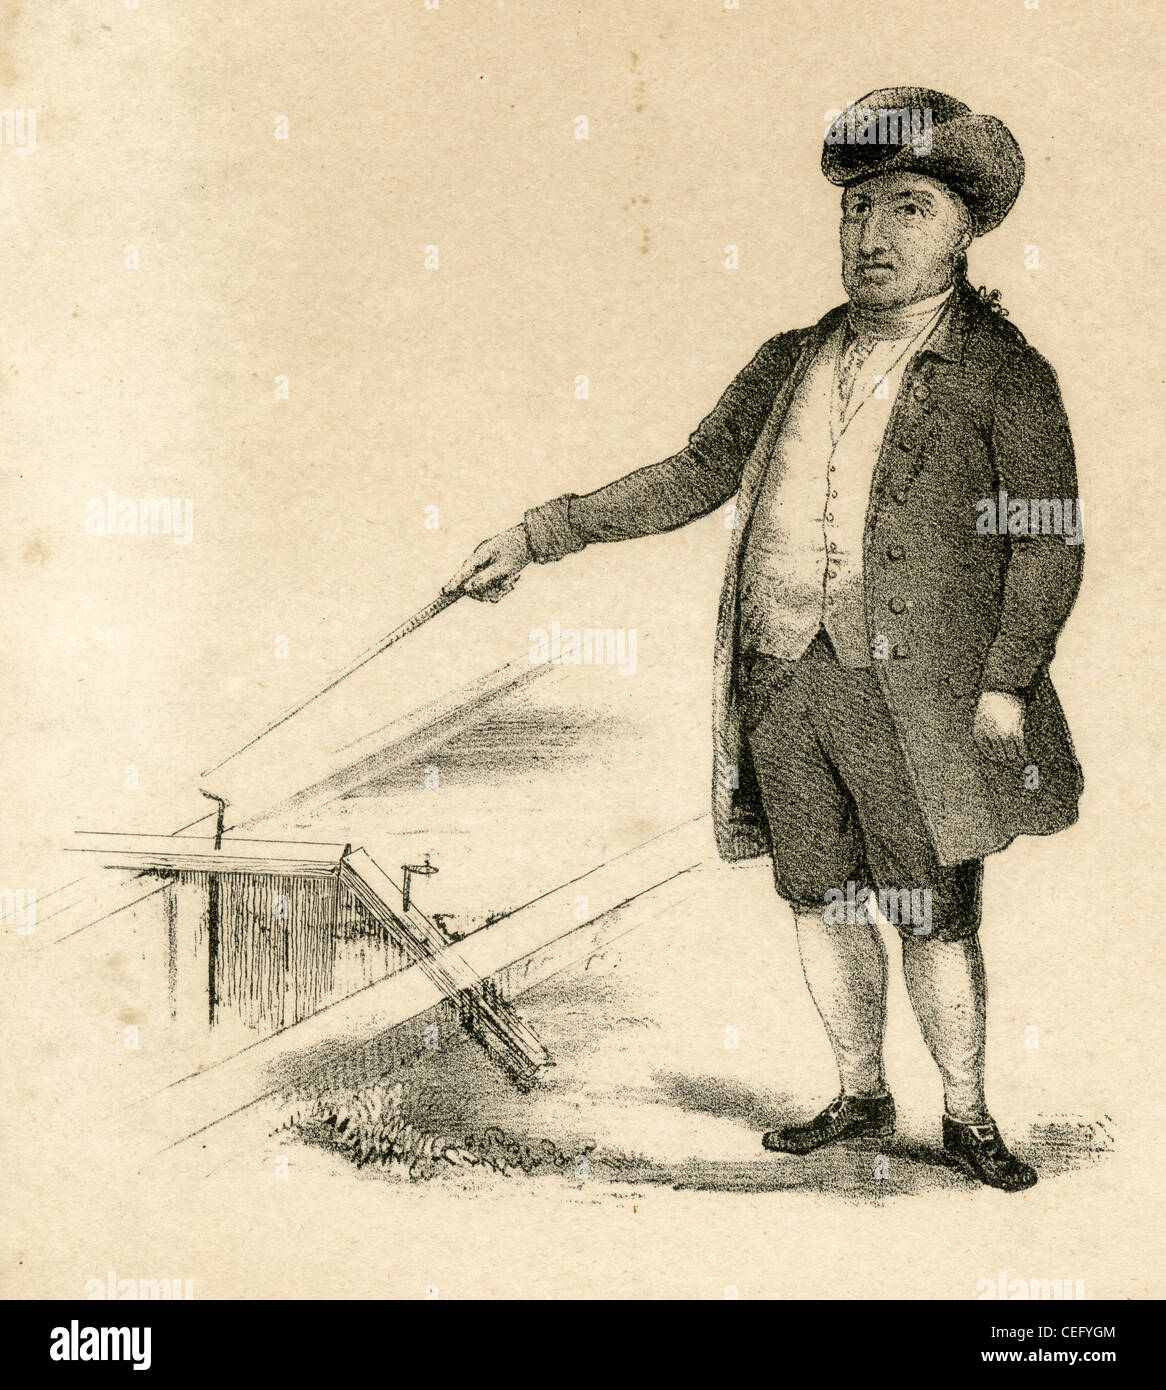 Circa 1810s engraving, Samuel Blodgett. - Stock Image